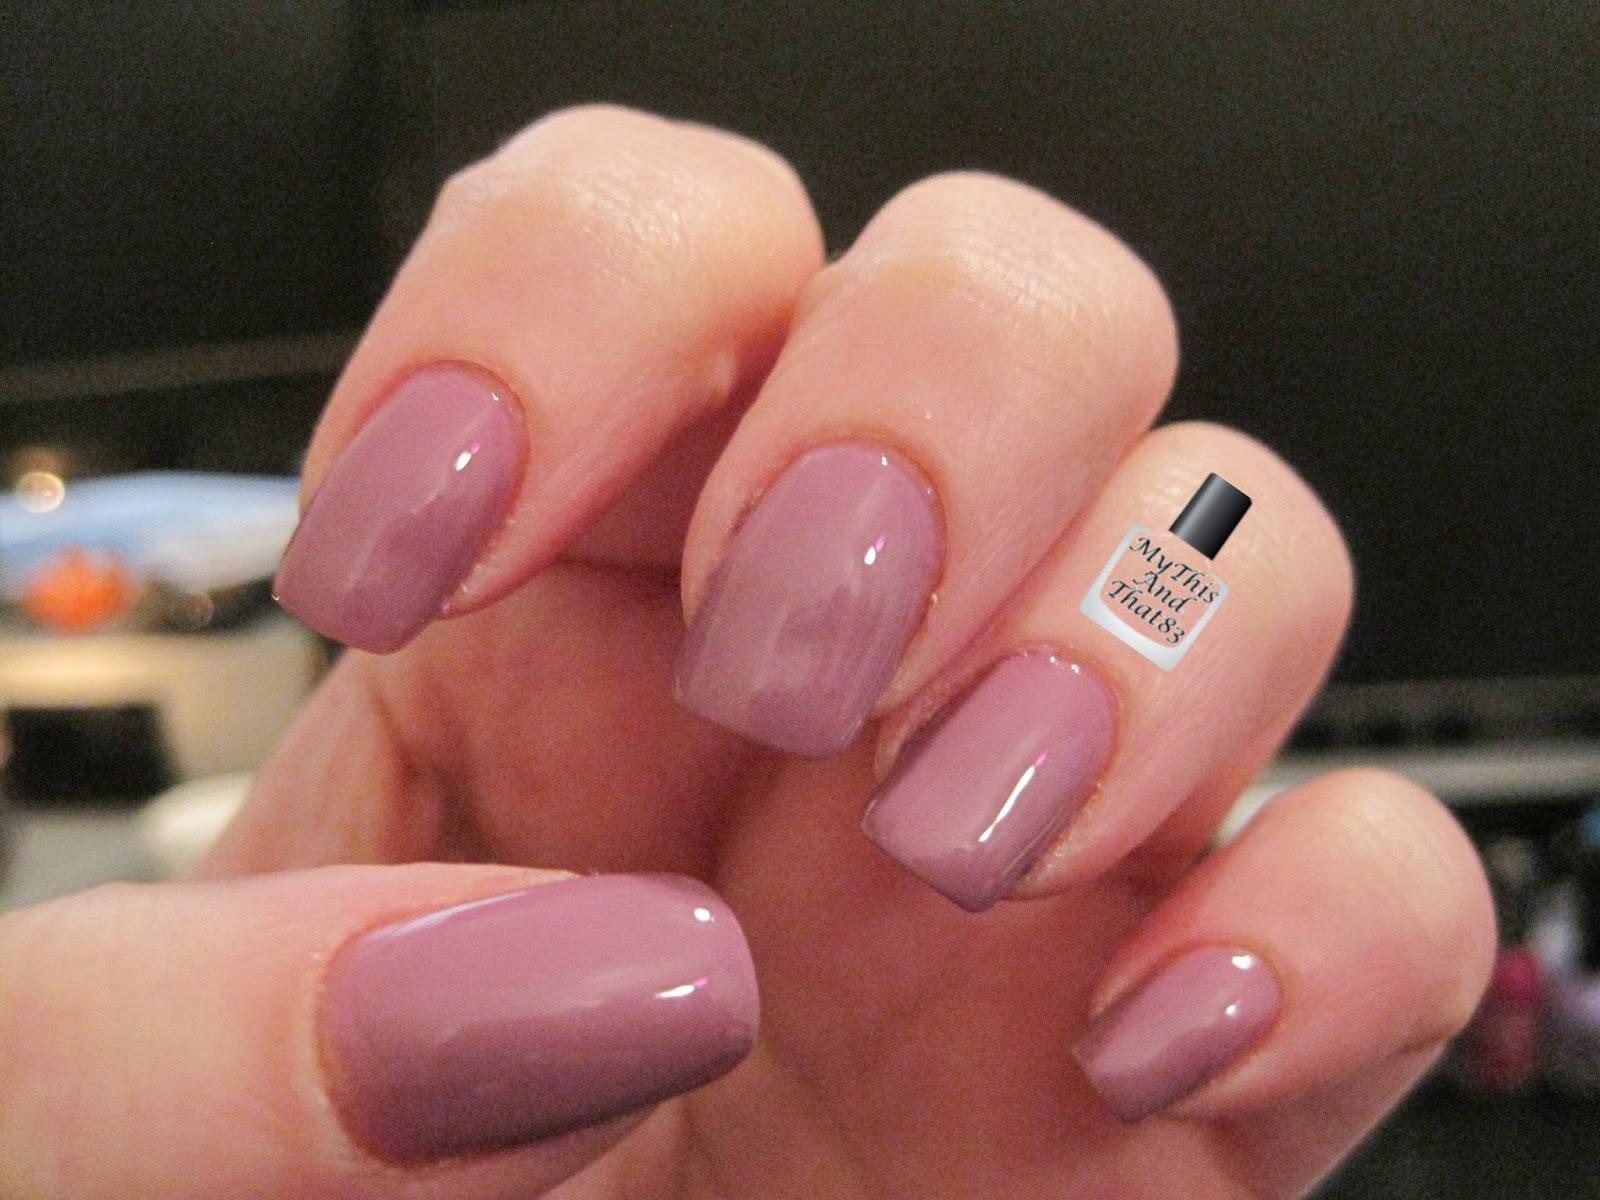 Lexington Lilac polish from NYC